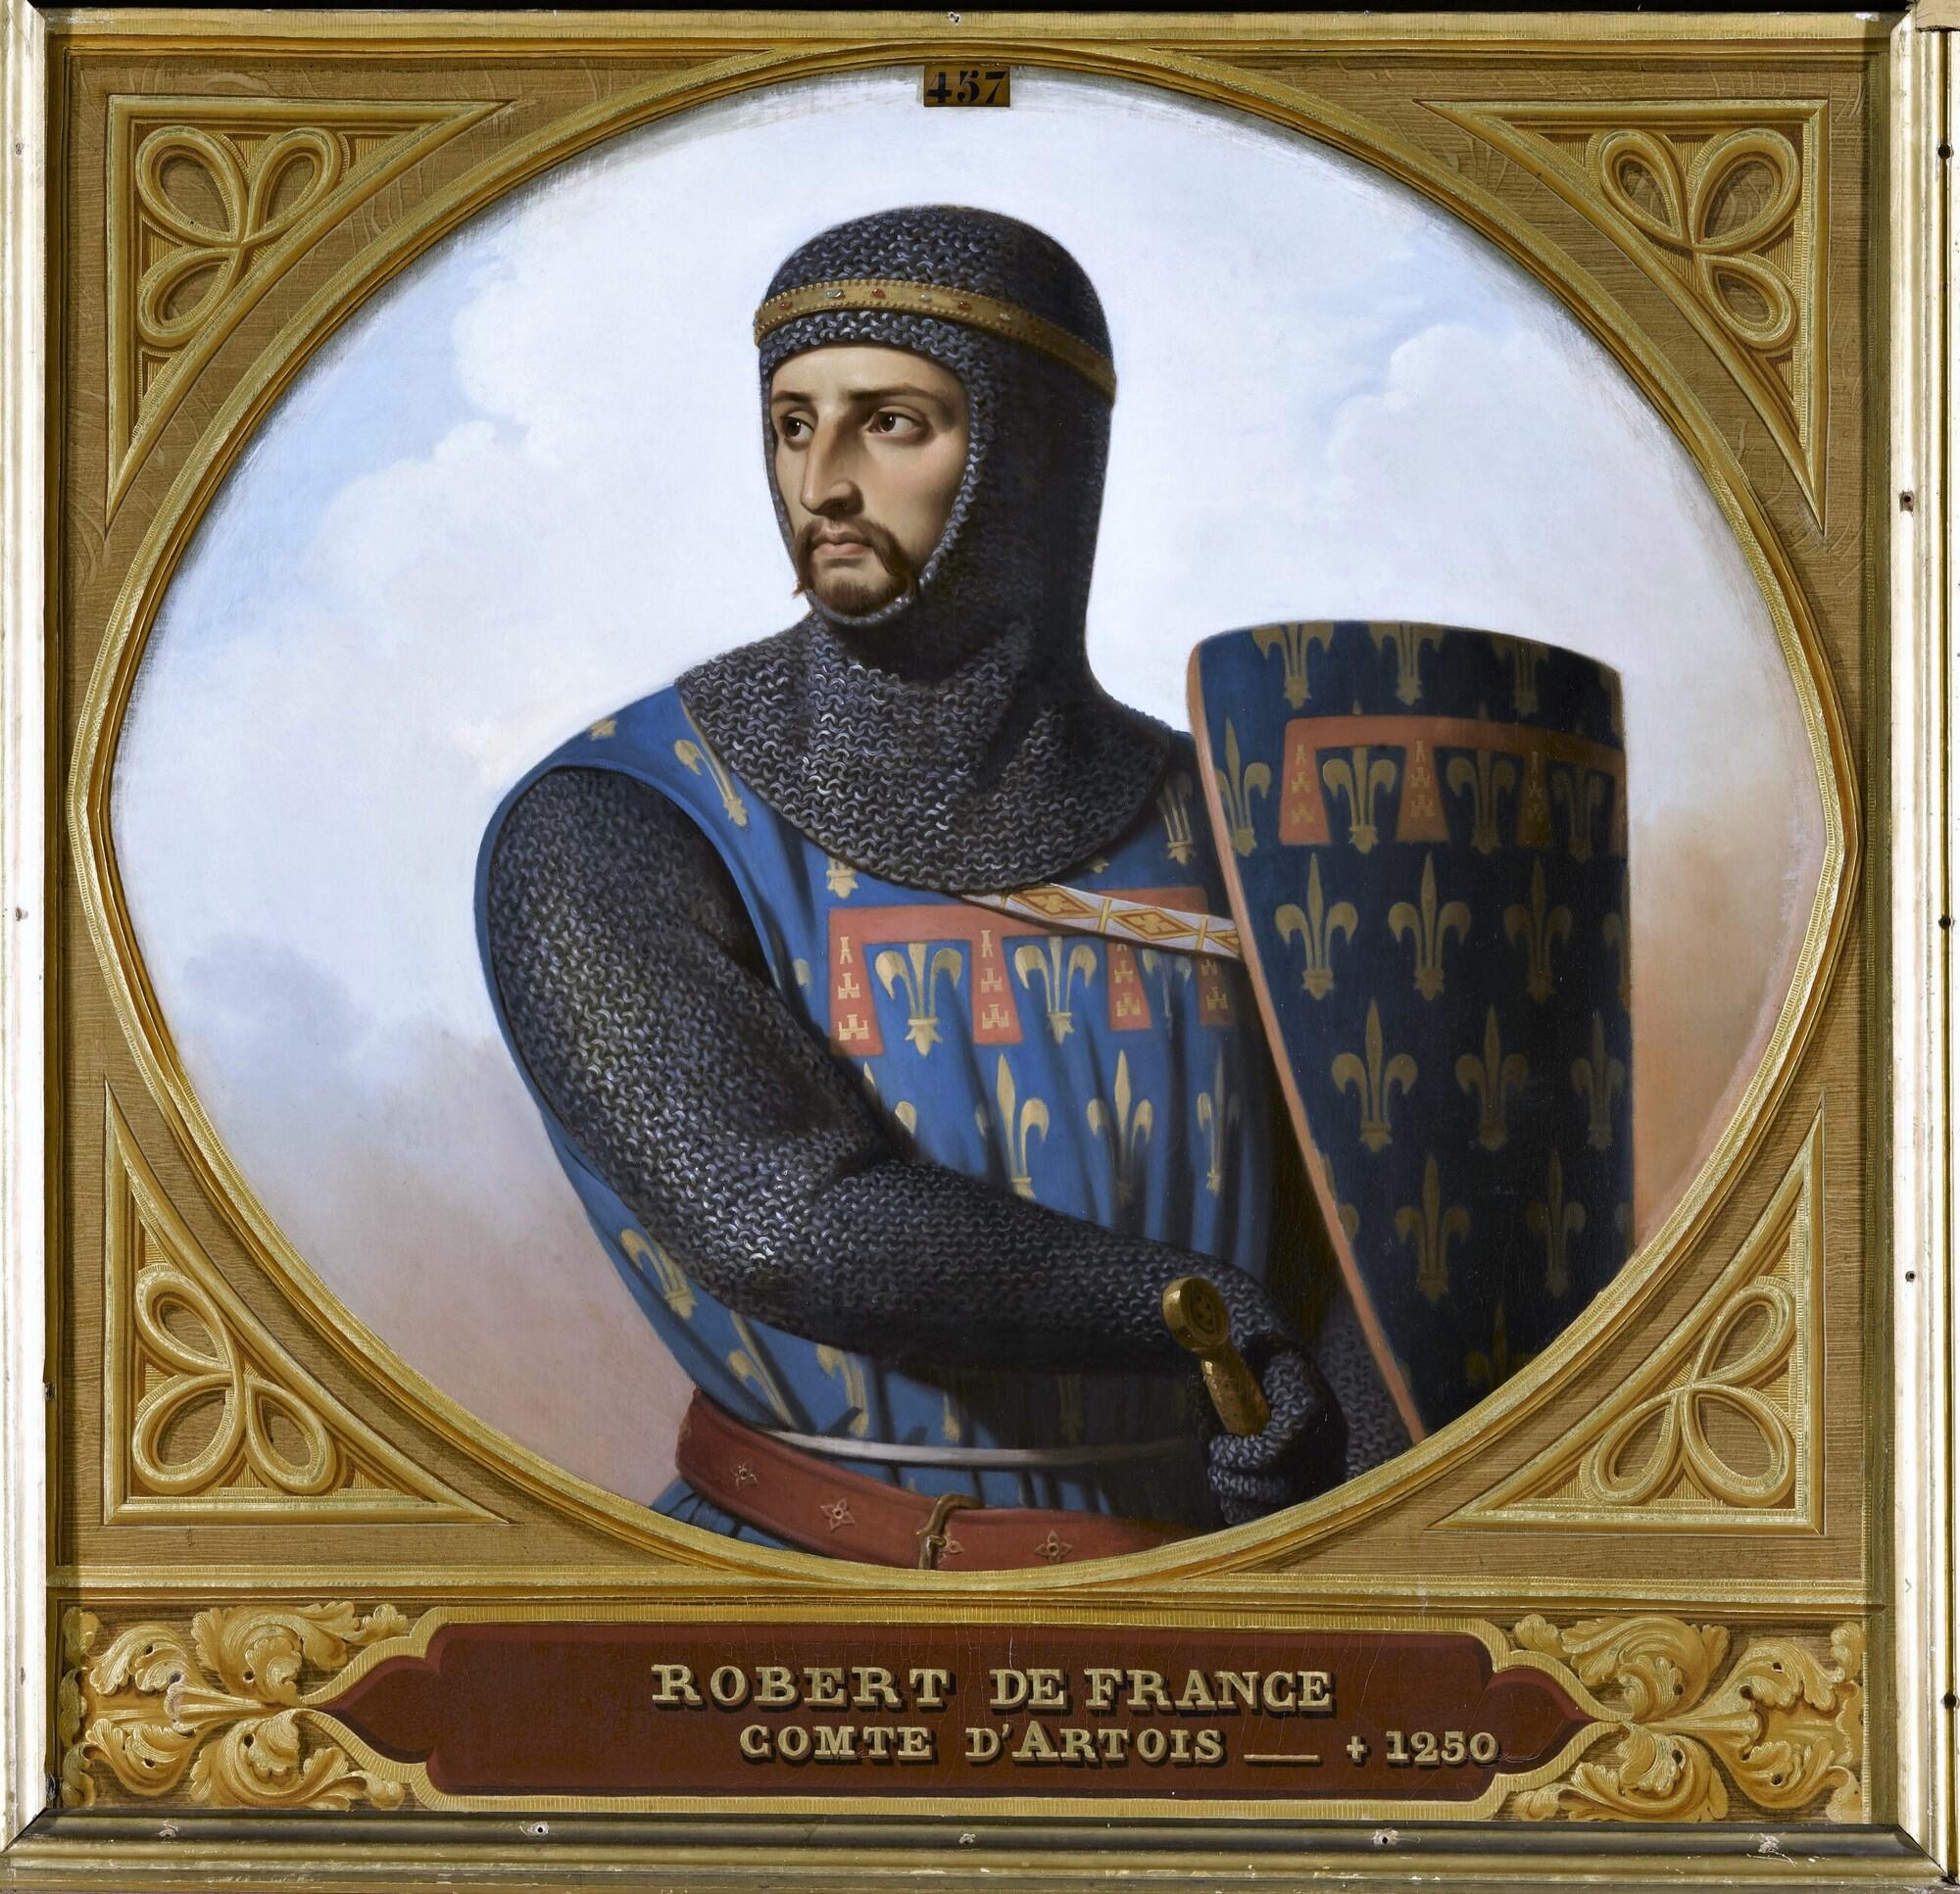 Robert de France, comte d'Artois. Peintre : Henri Decaisne.